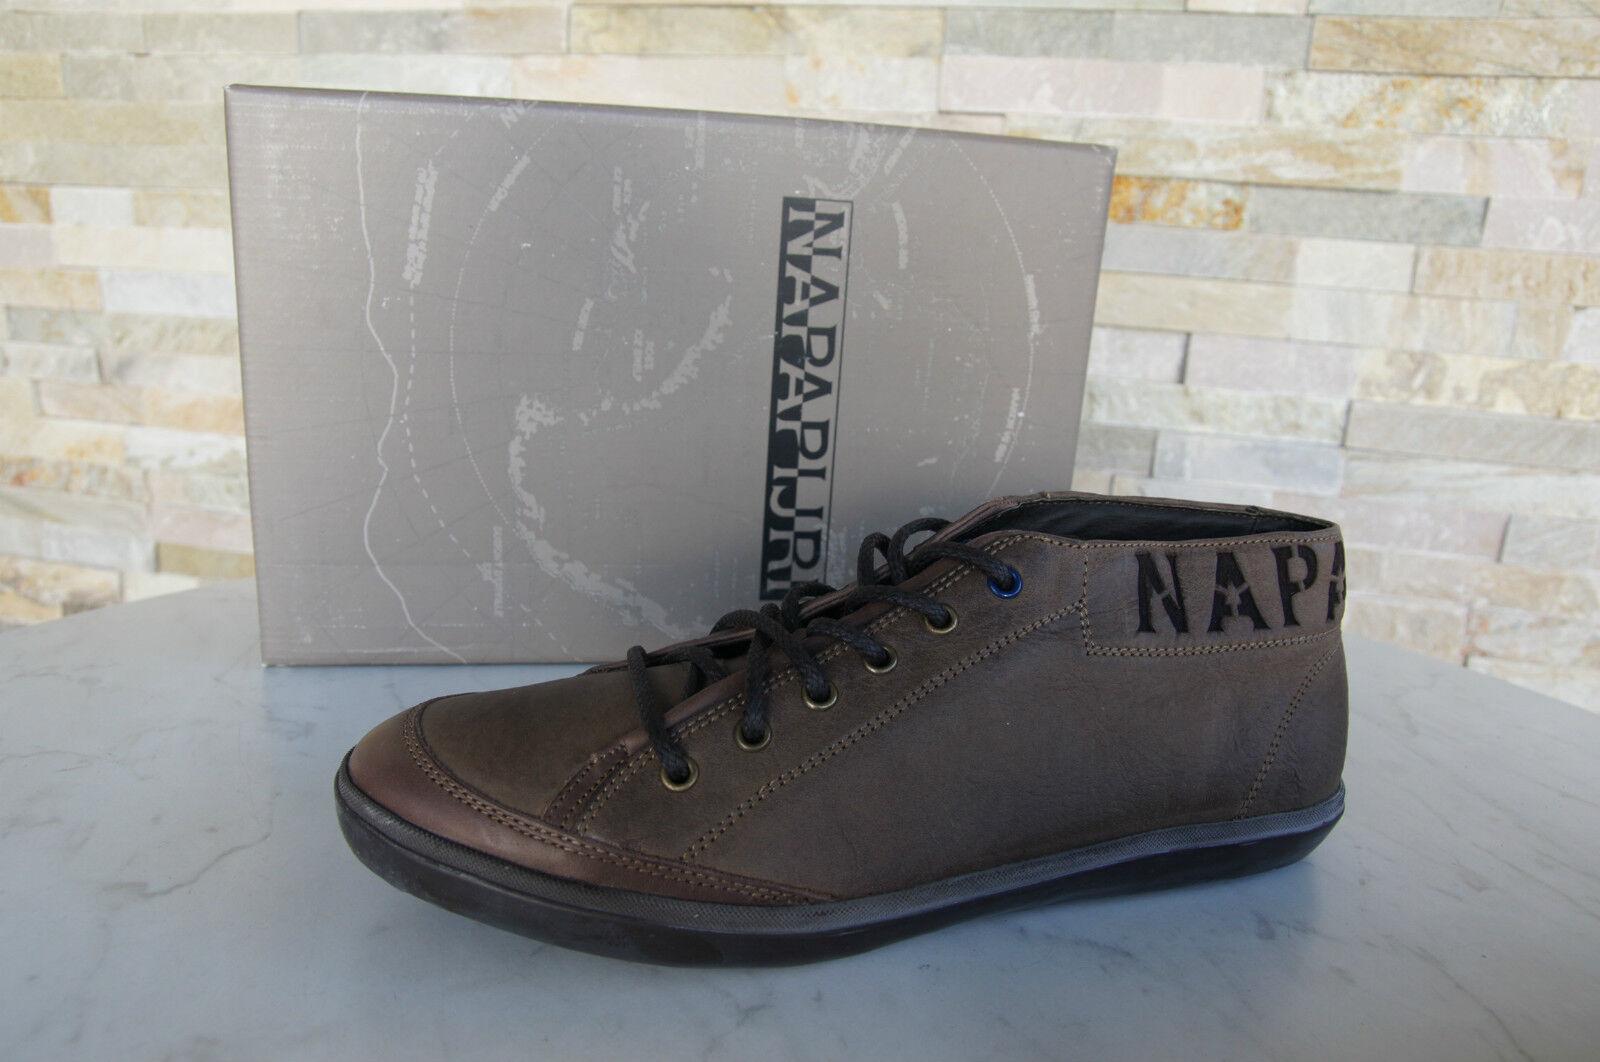 NAPAPIJRI Gr 45 11 Schnürschuhe Sven braun High Top Sneakers Schuhes braun Sven neu UVP 149 658361